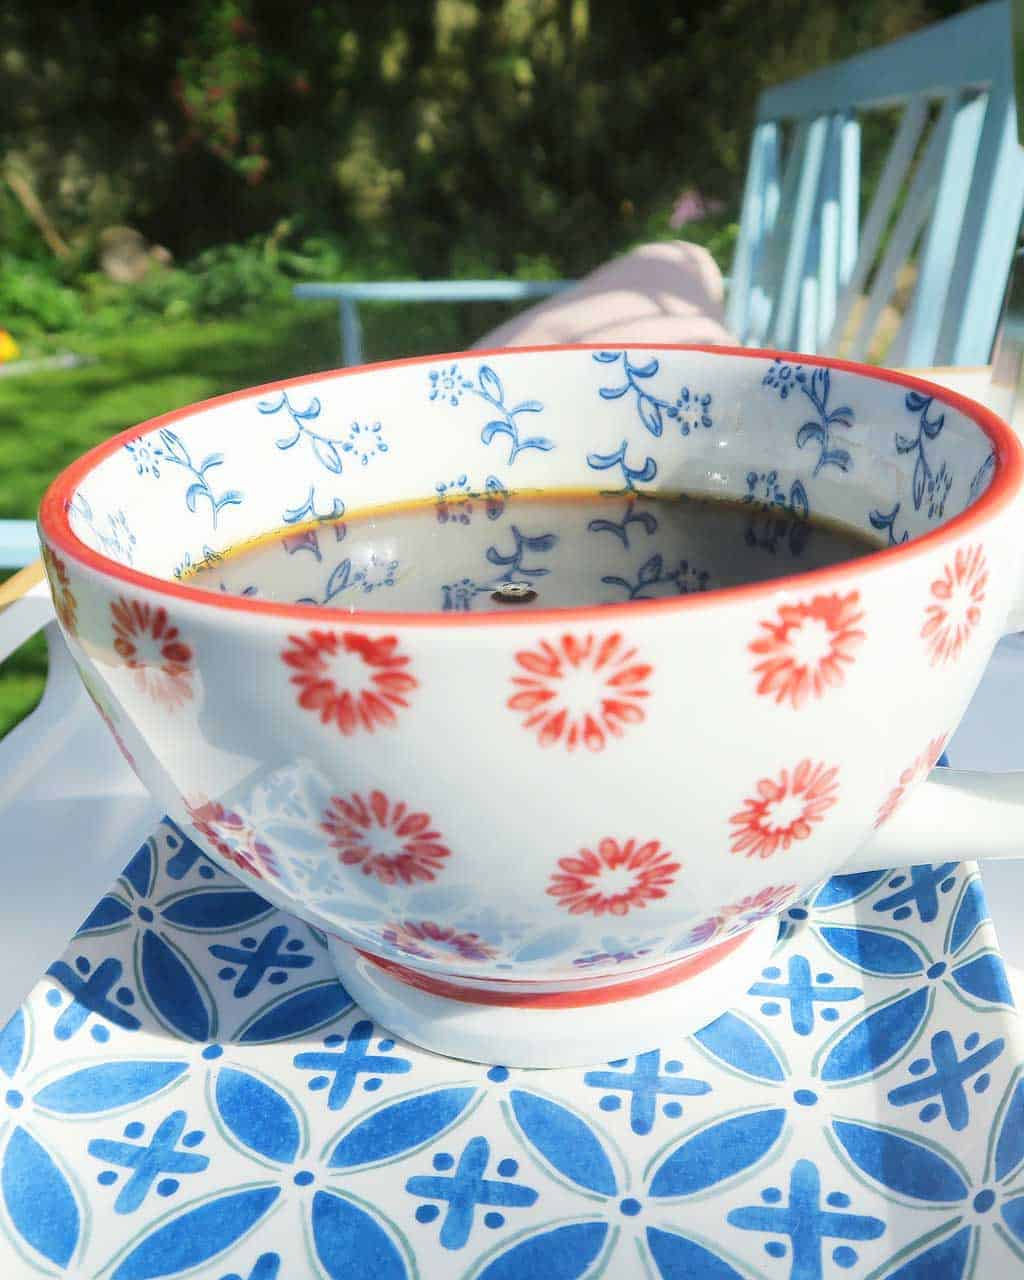 HomeSense coffee cup